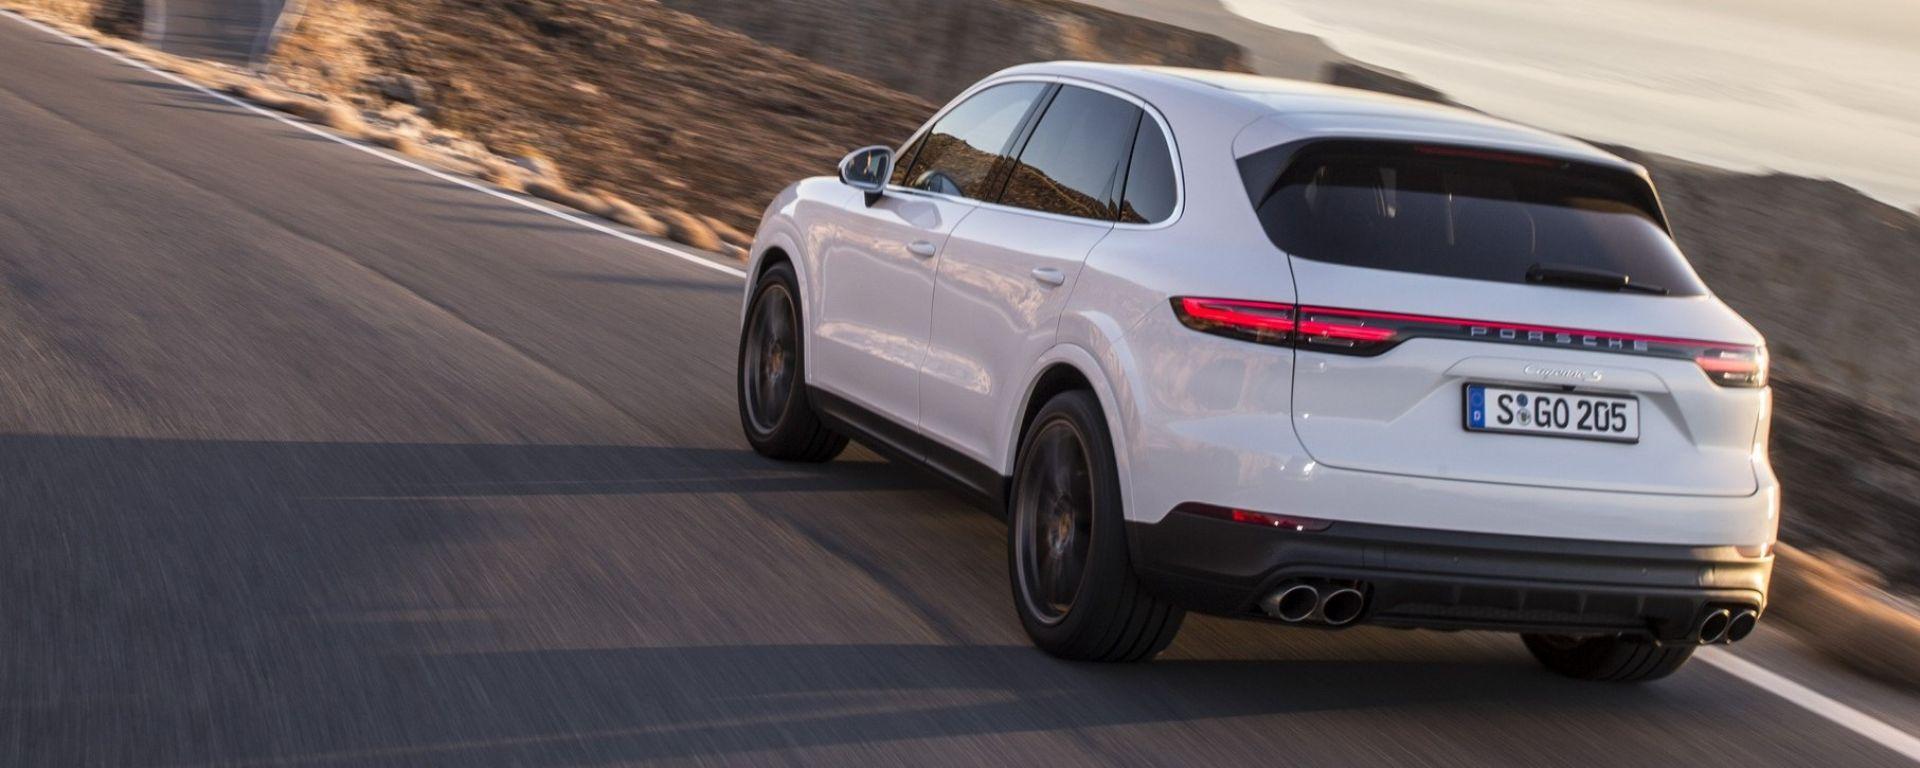 Nuova Porsche Cayenne 2018: la video-prova